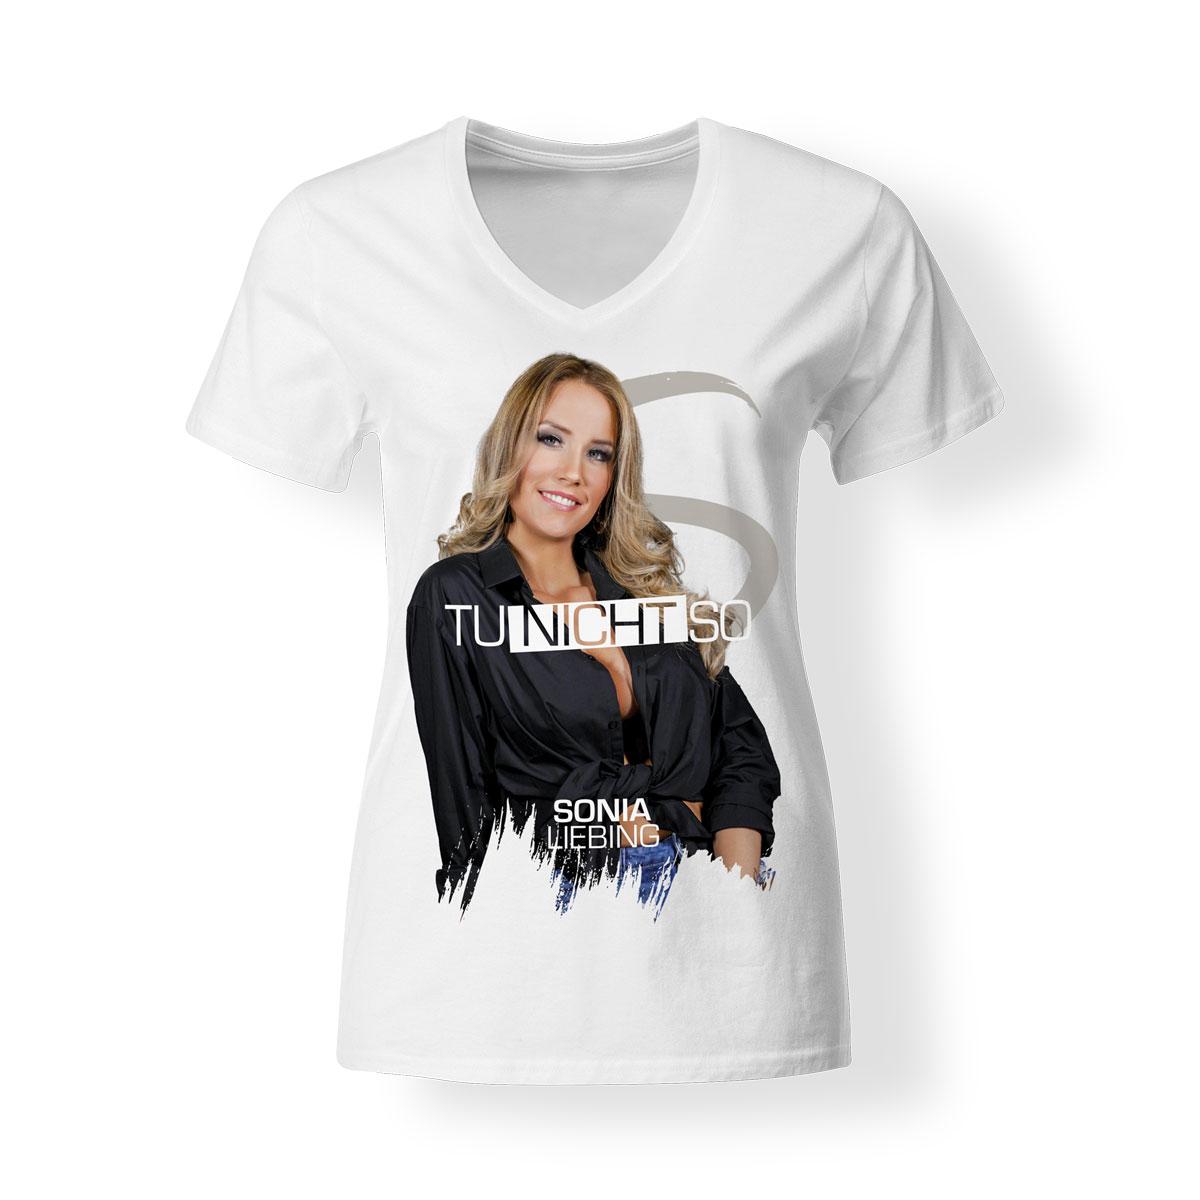 Sonia Liebing Fanartikel T-Shirts